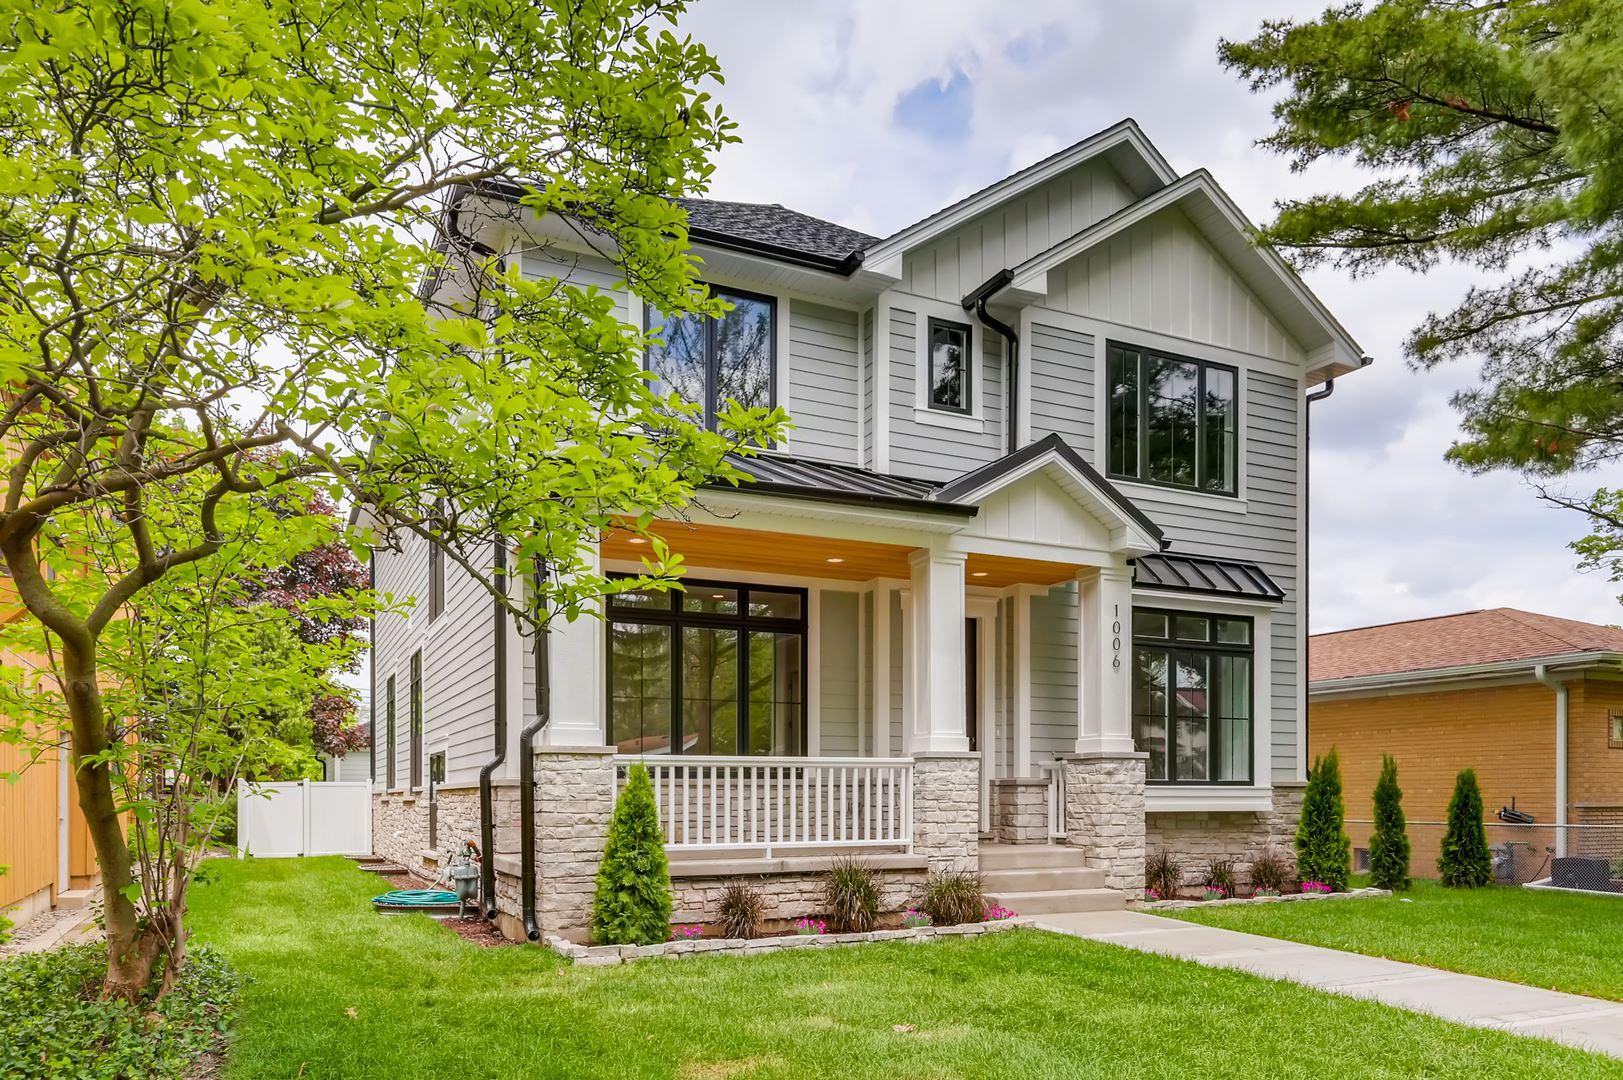 1006 garden Street, Park Ridge, IL 60068 - #: 10730430